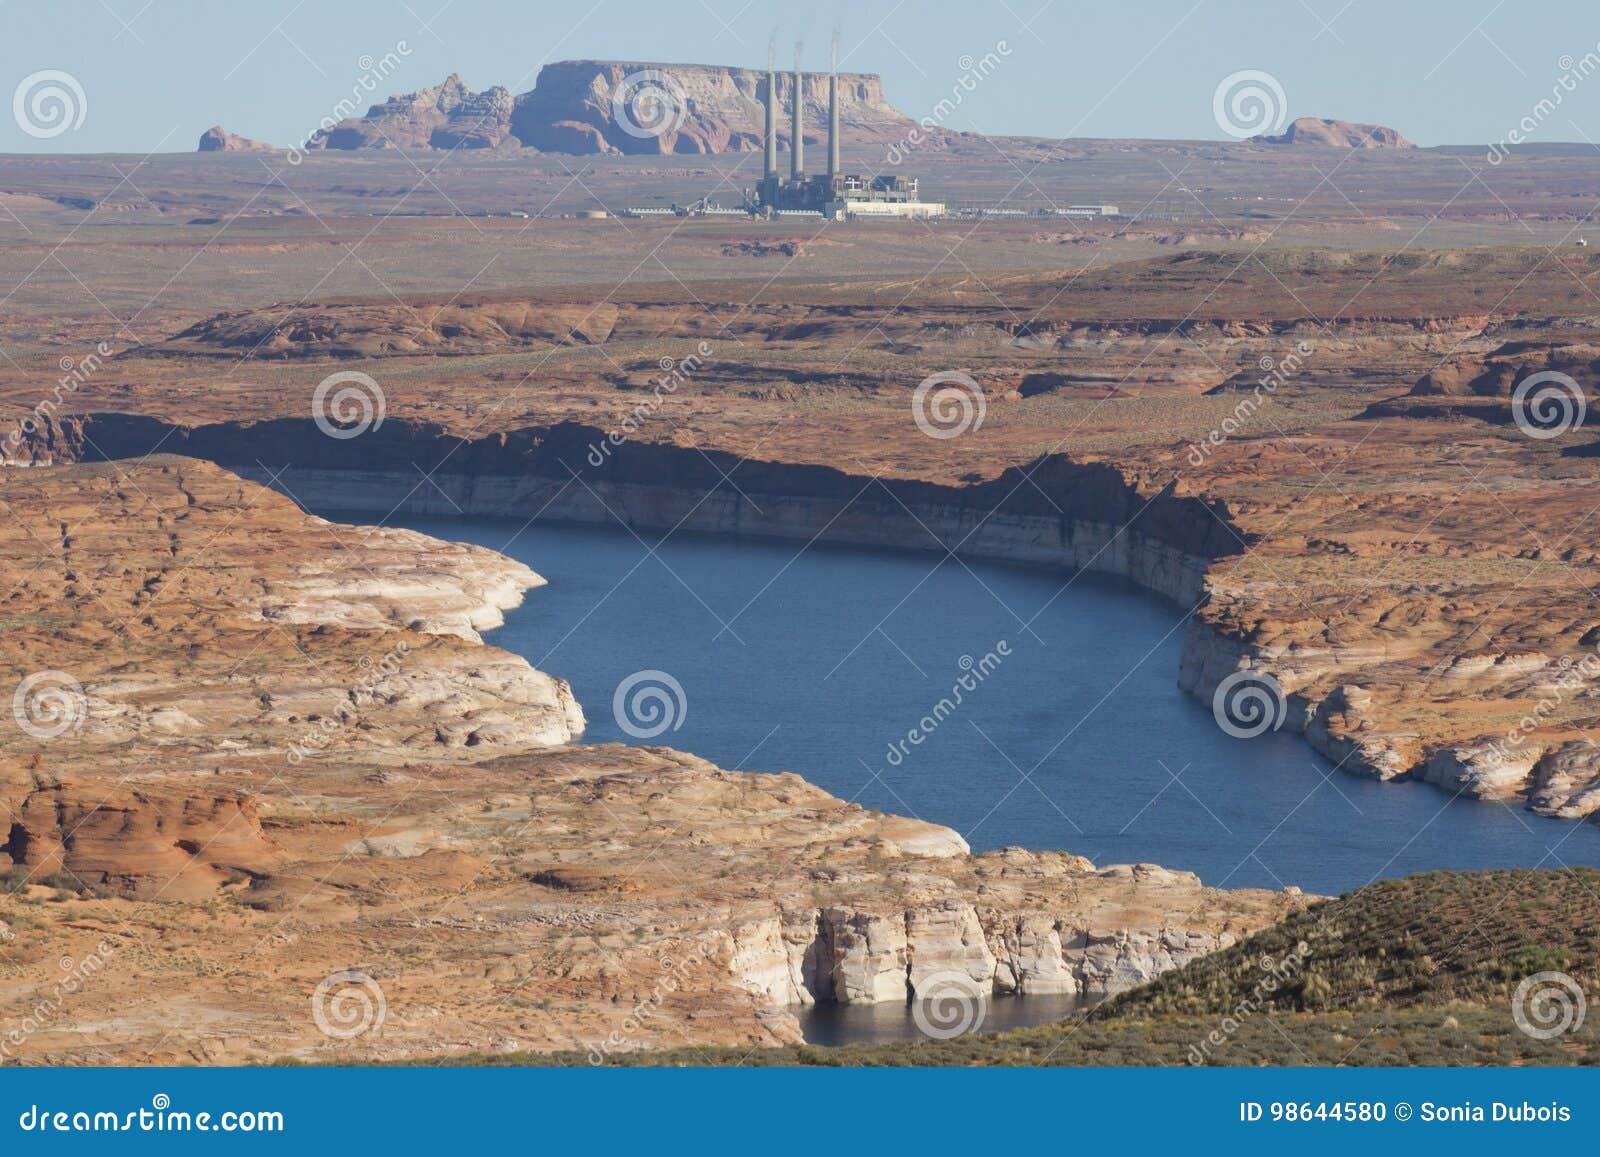 Salt River Project-Navajo Generating Station